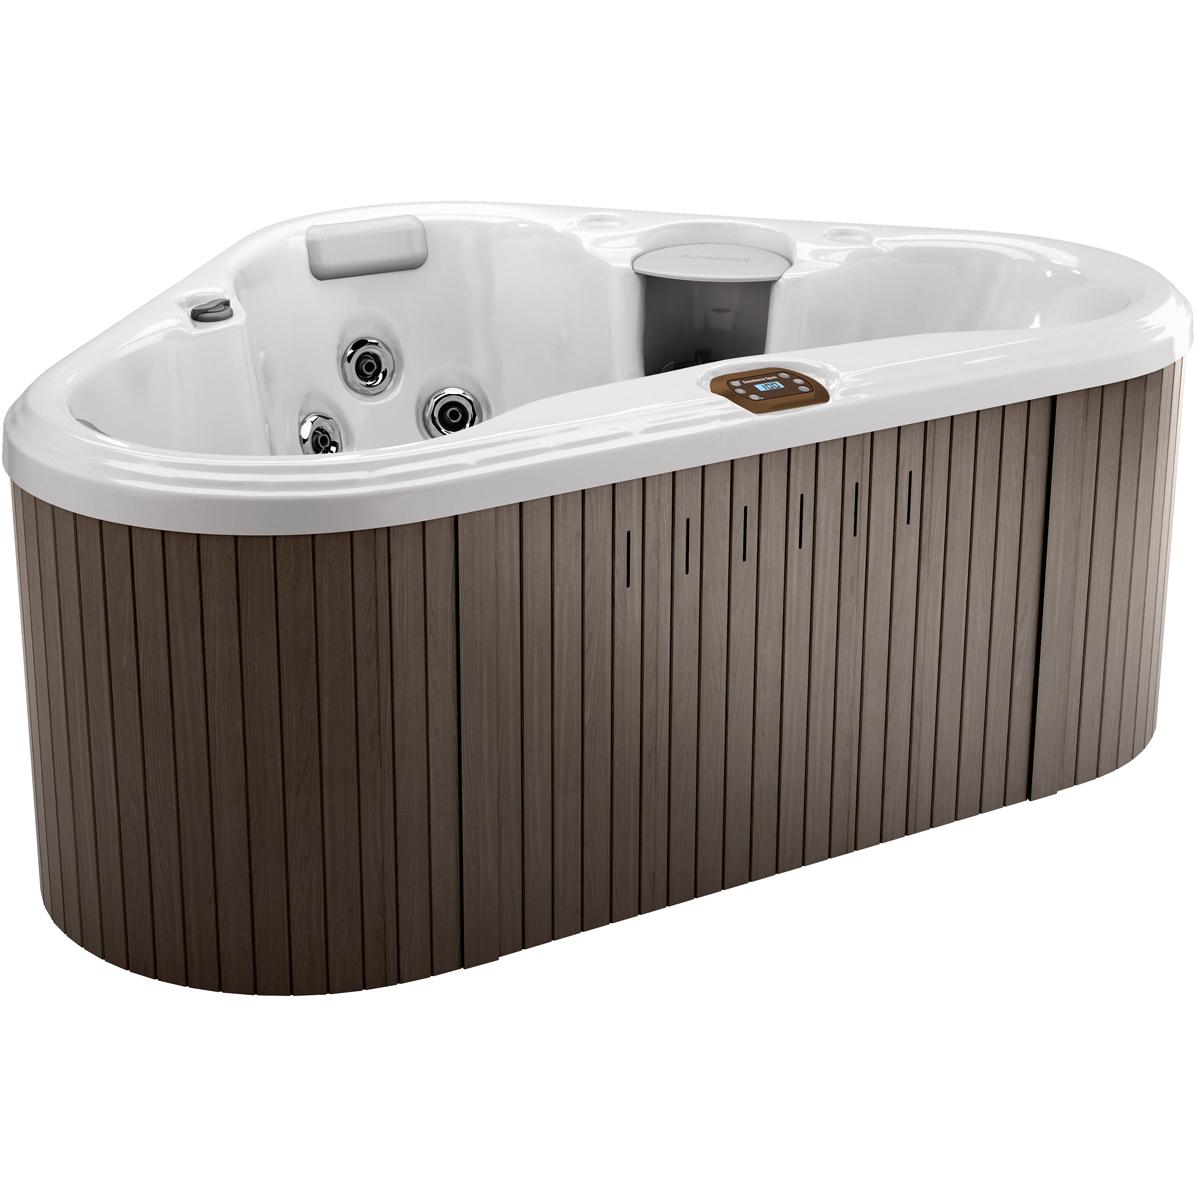 Sundance Tacoma® - 680™ Series Hot Tub - Sundance® Spas ...